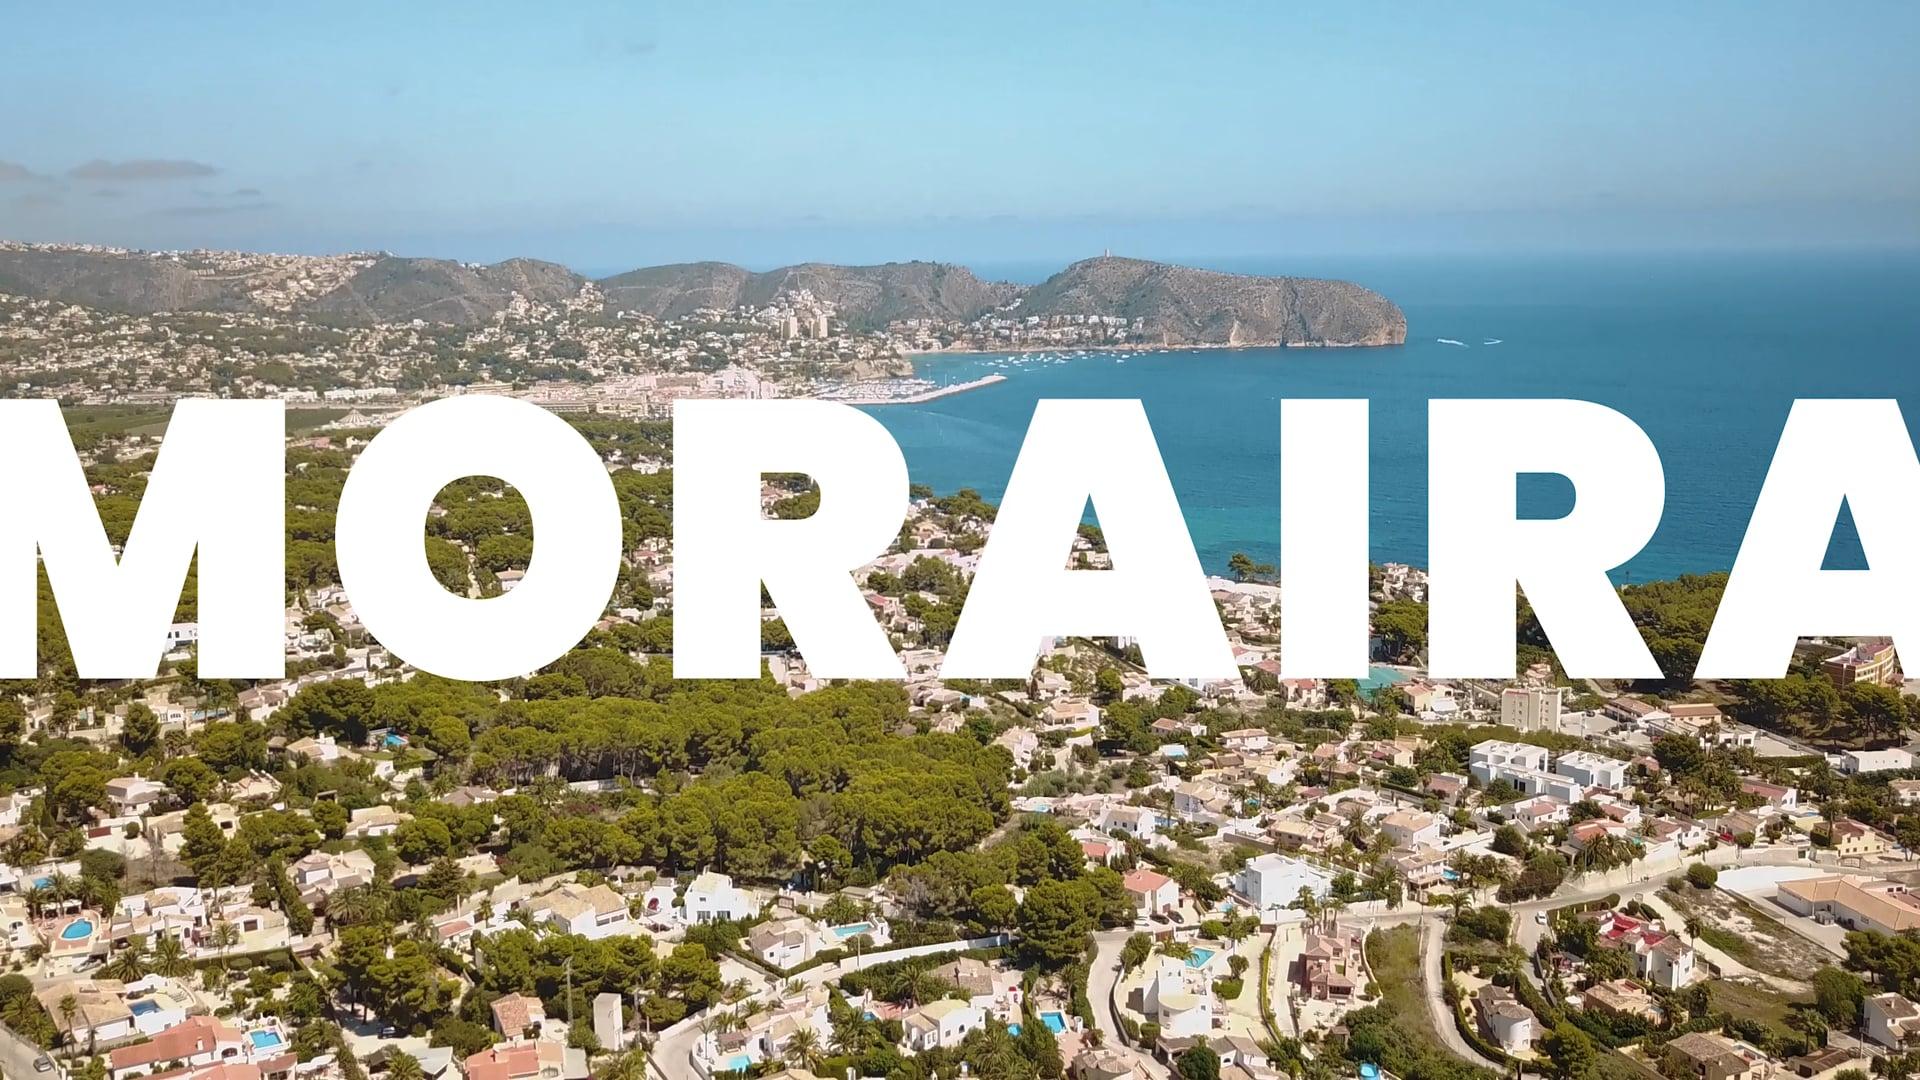 #VisitMoraira - Full Promo